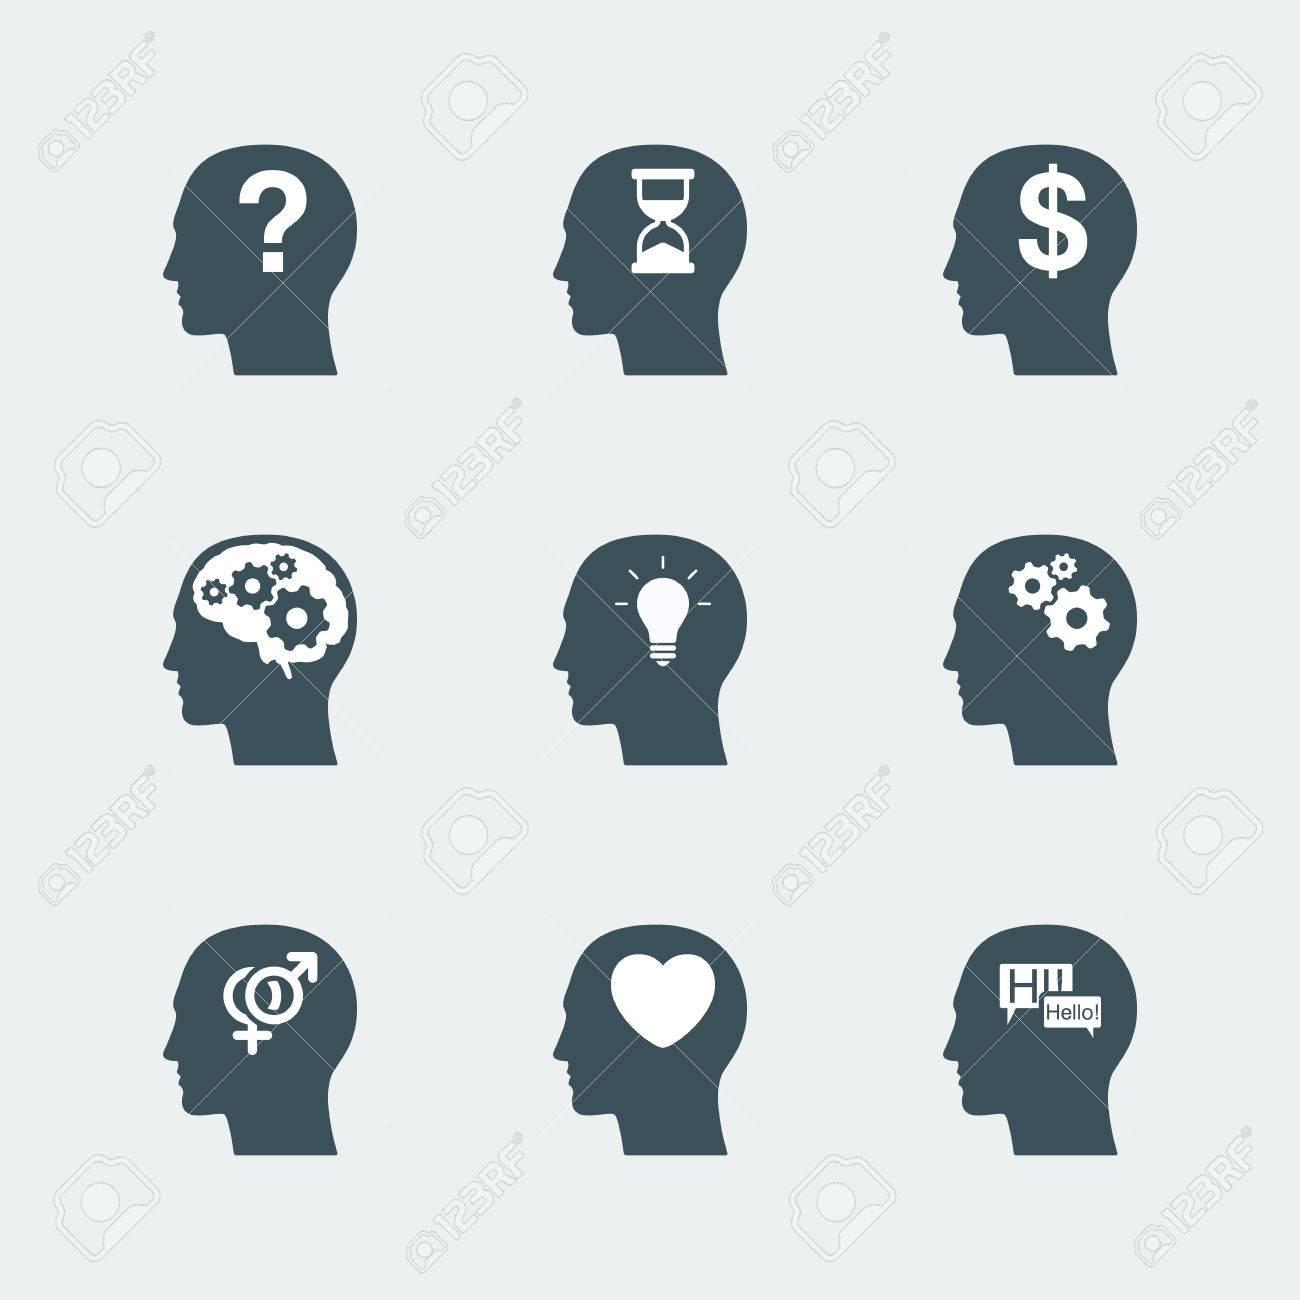 Human head icons set symbol of thinking process and idea concept human head icons set symbol of thinking process and idea concept relation and communication biocorpaavc